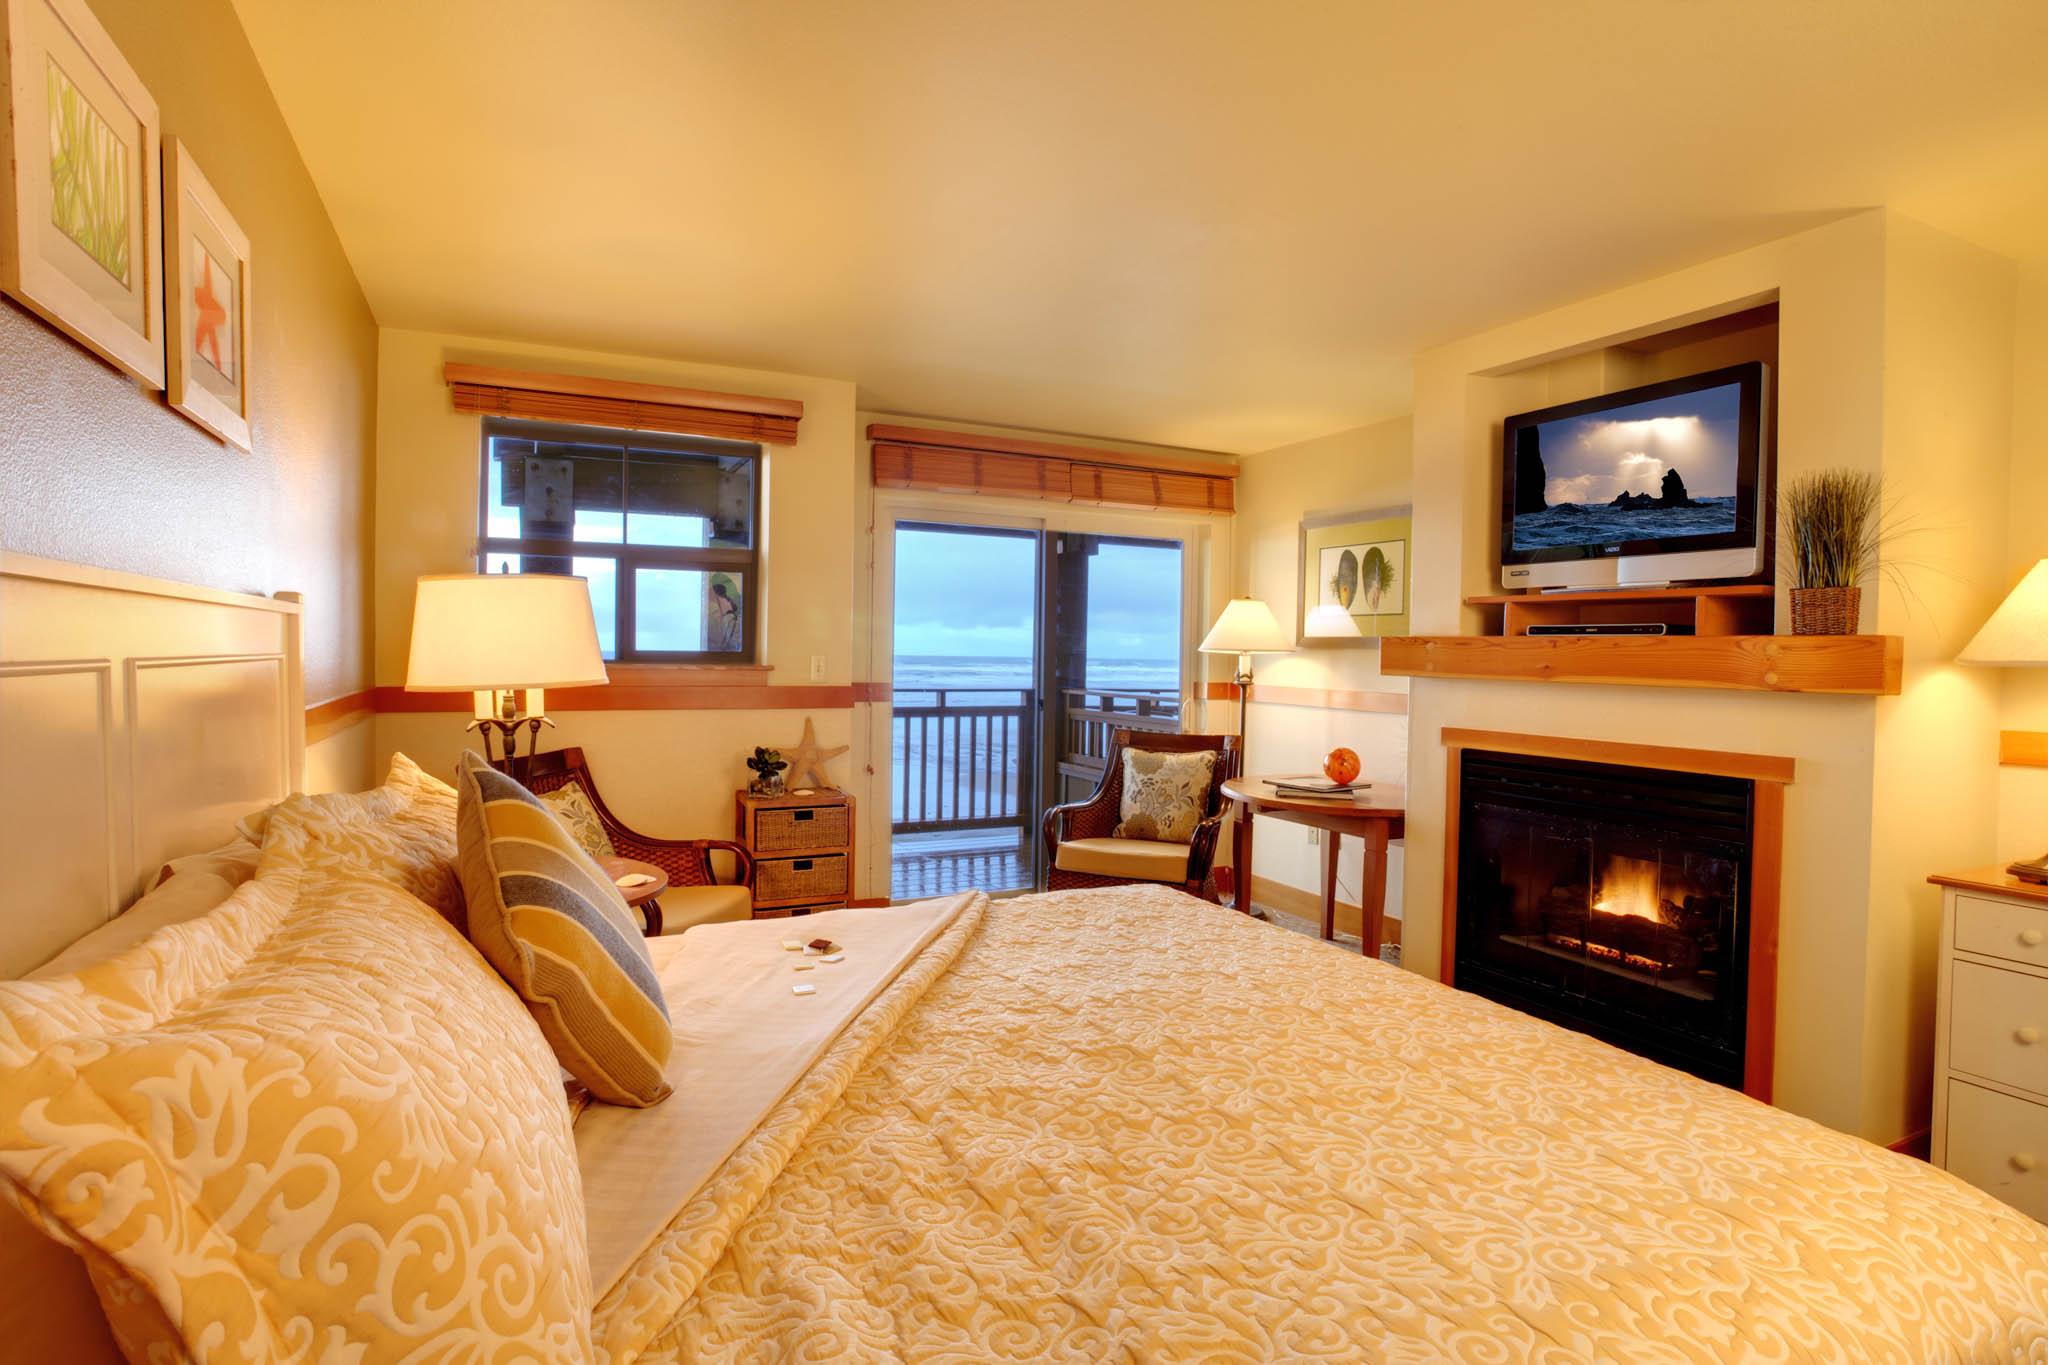 The Ocean Lodge in Cannon Beach, Oregon